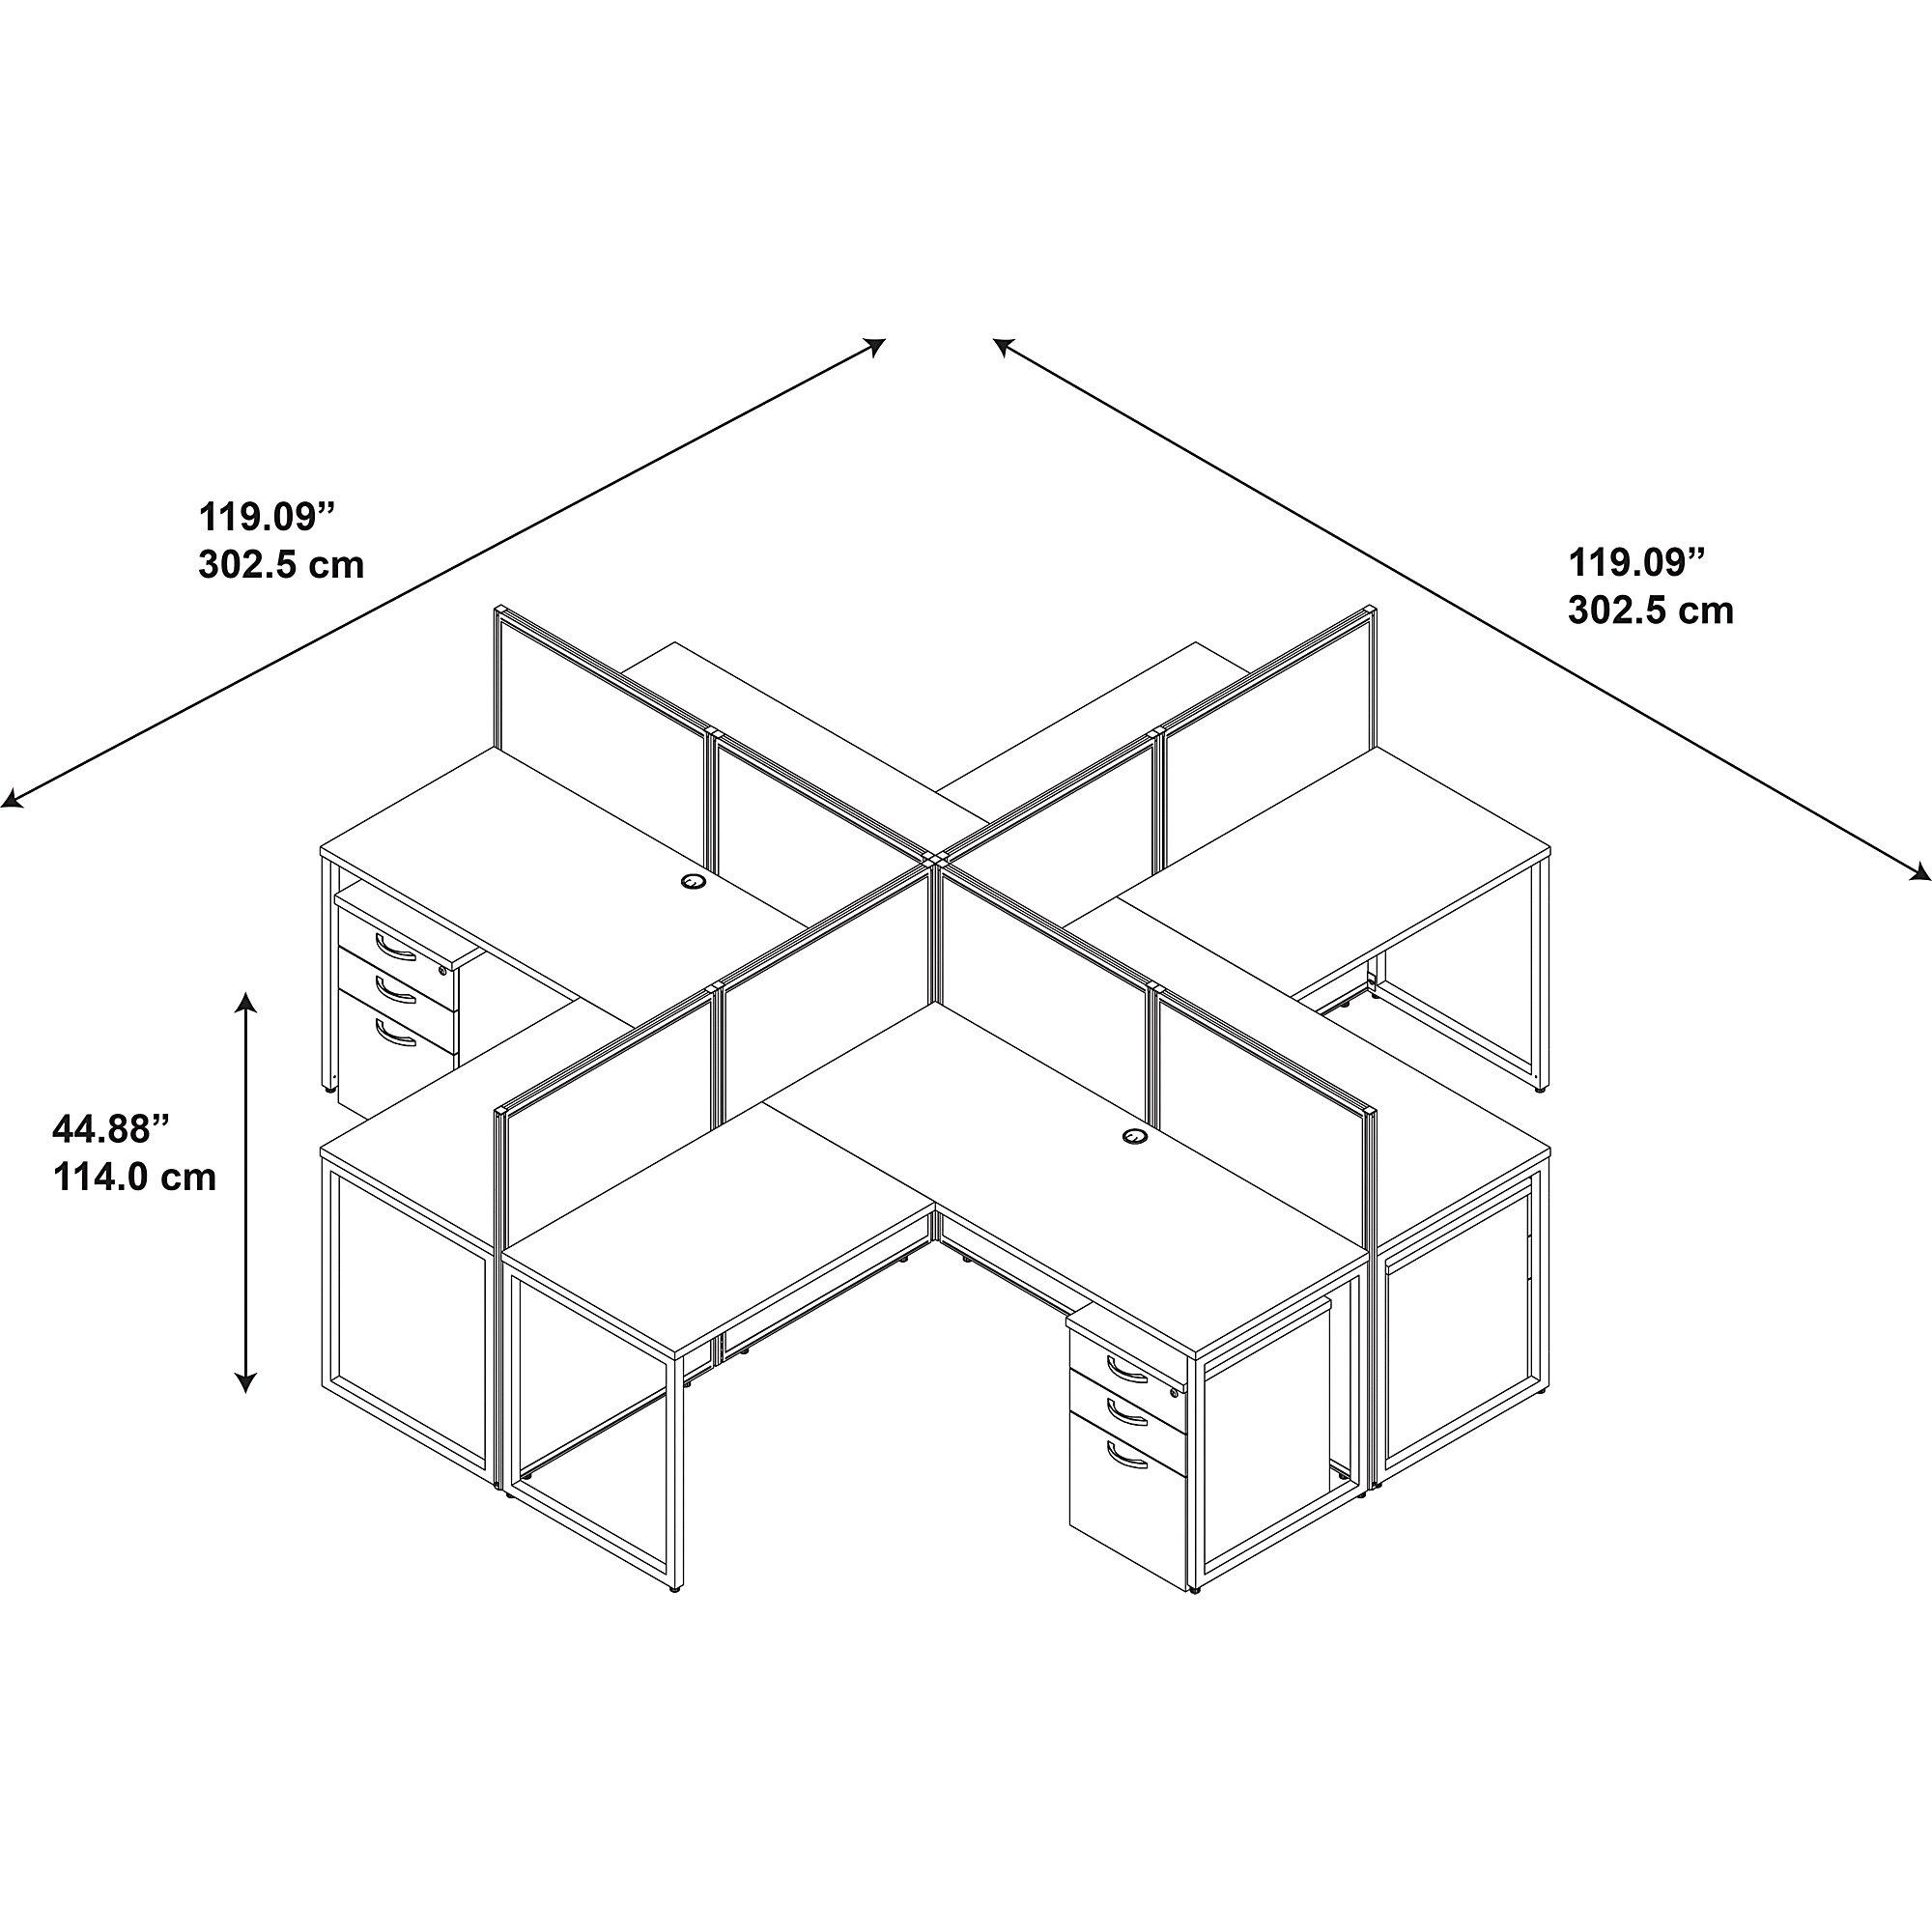 cubicle dimensions